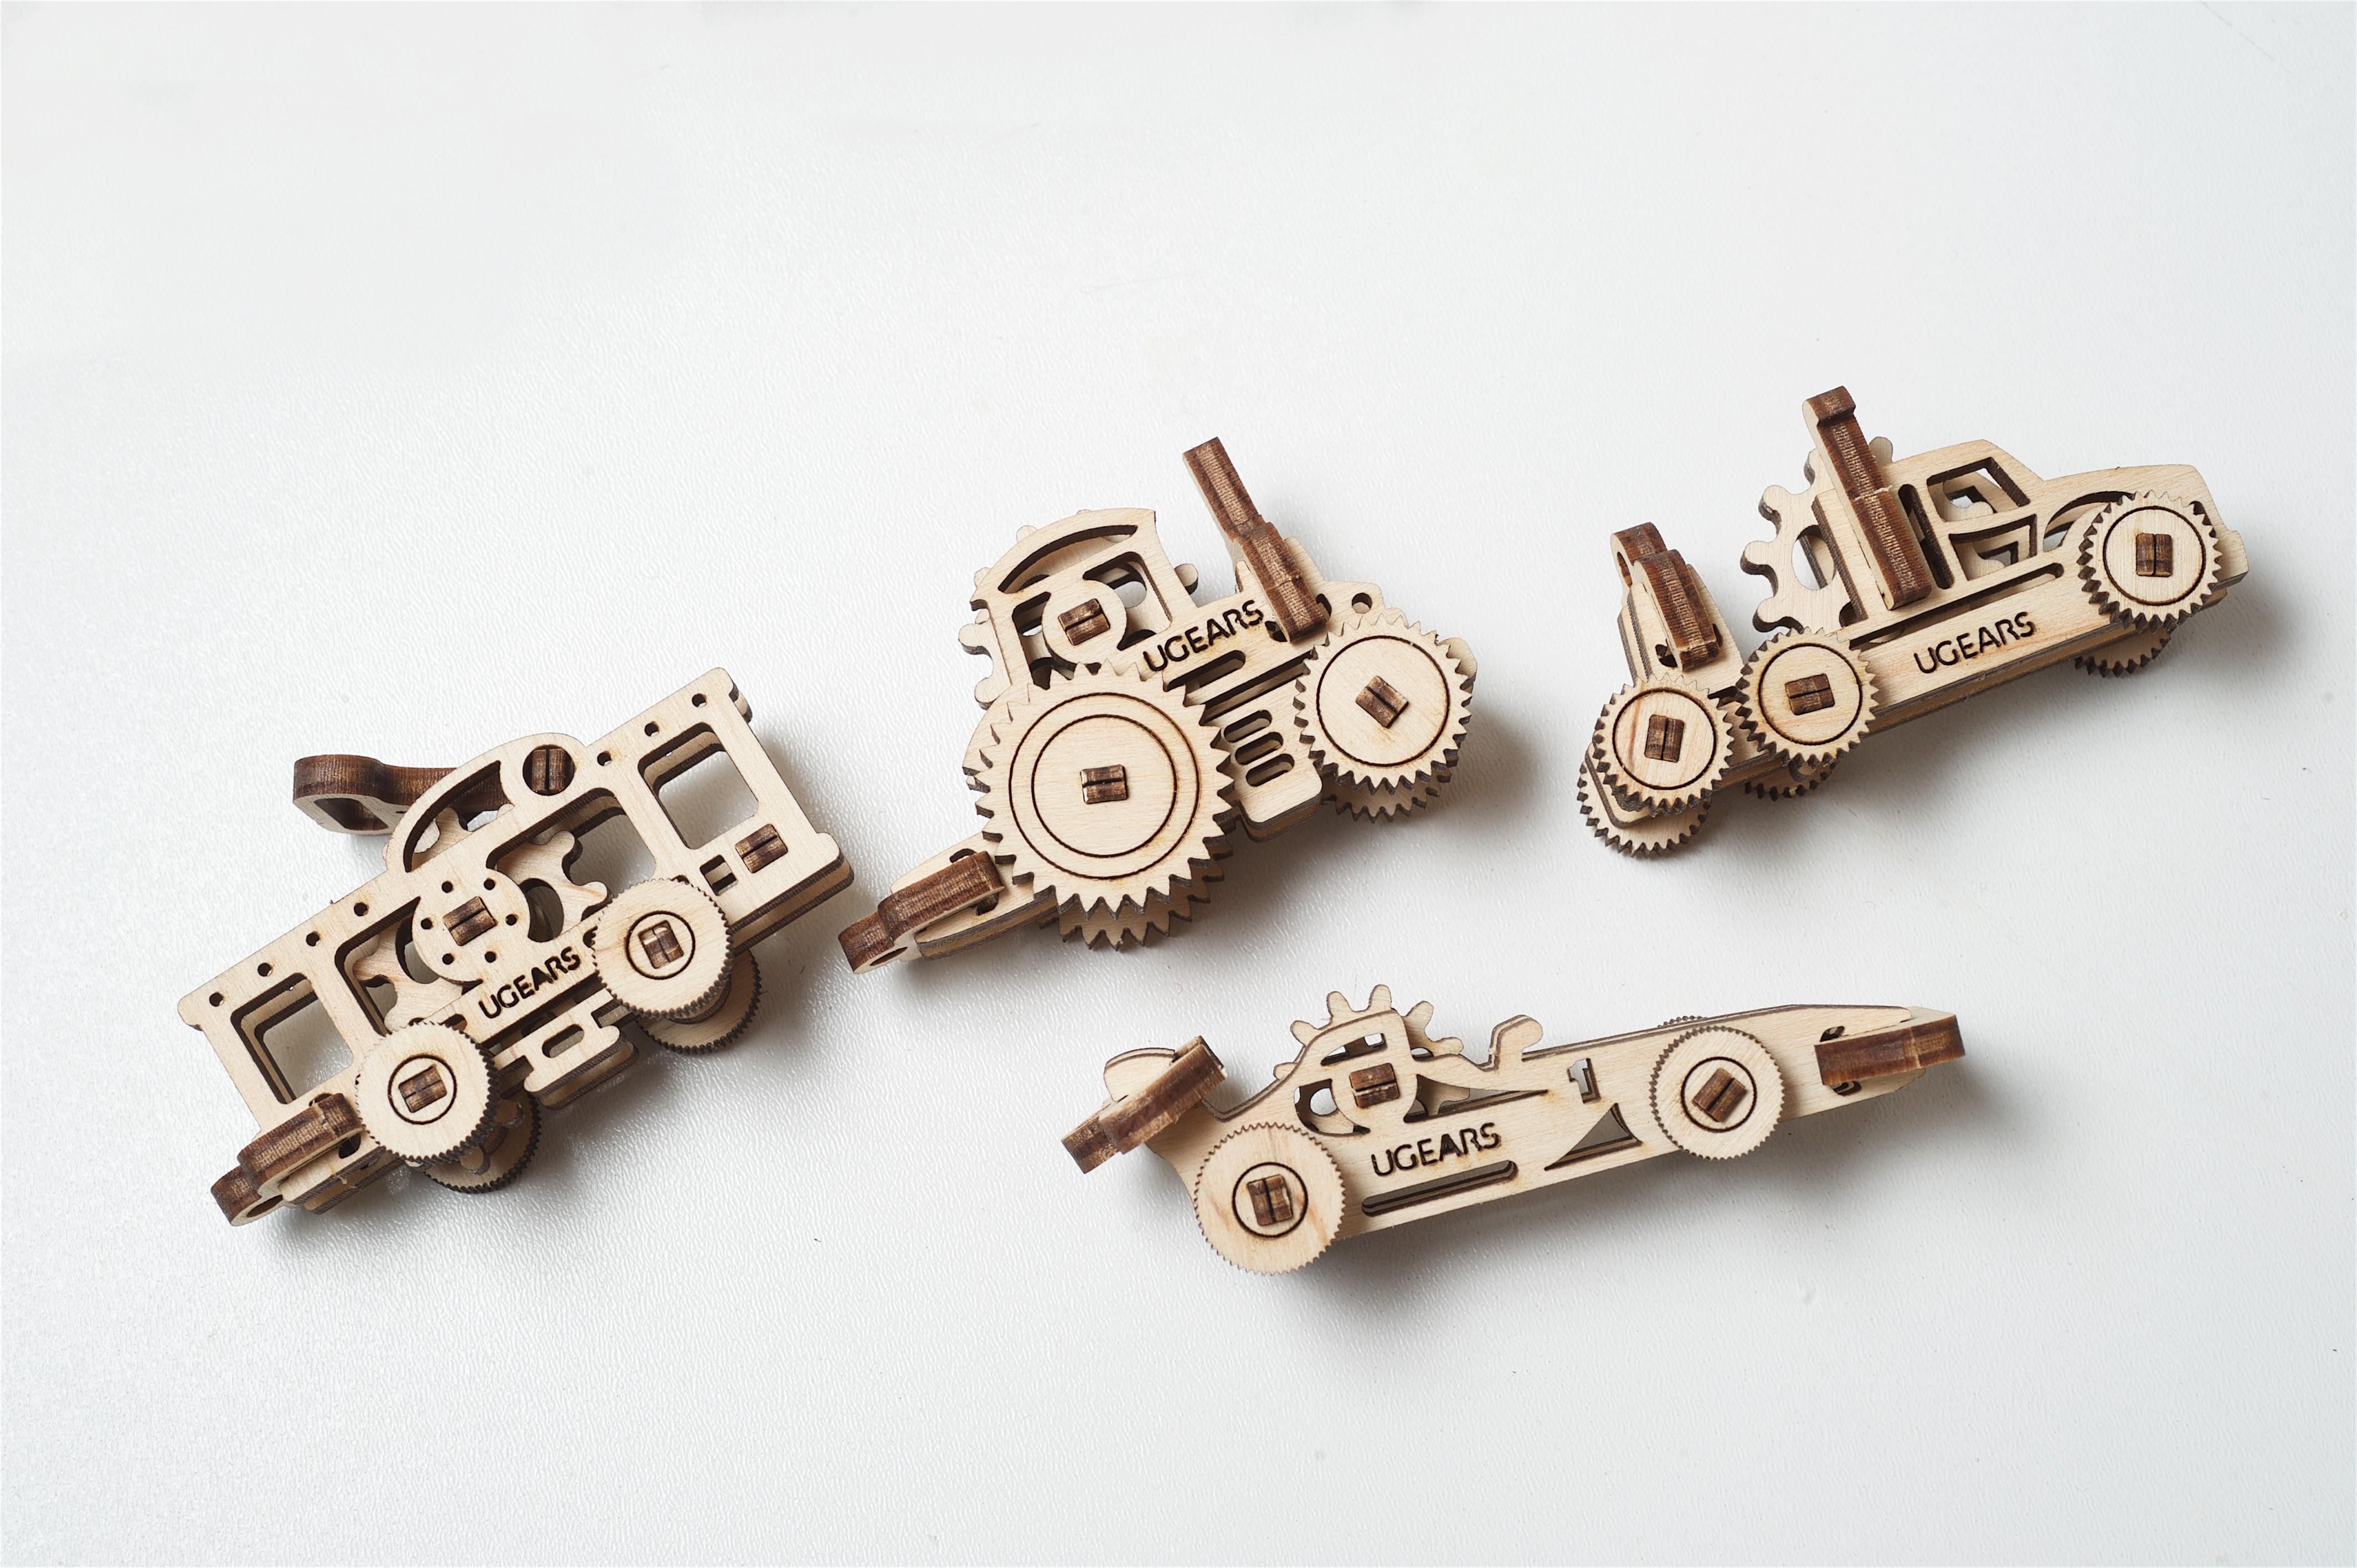 Конструктор 3D-пазл Ugears - Трибики (4 шт.)